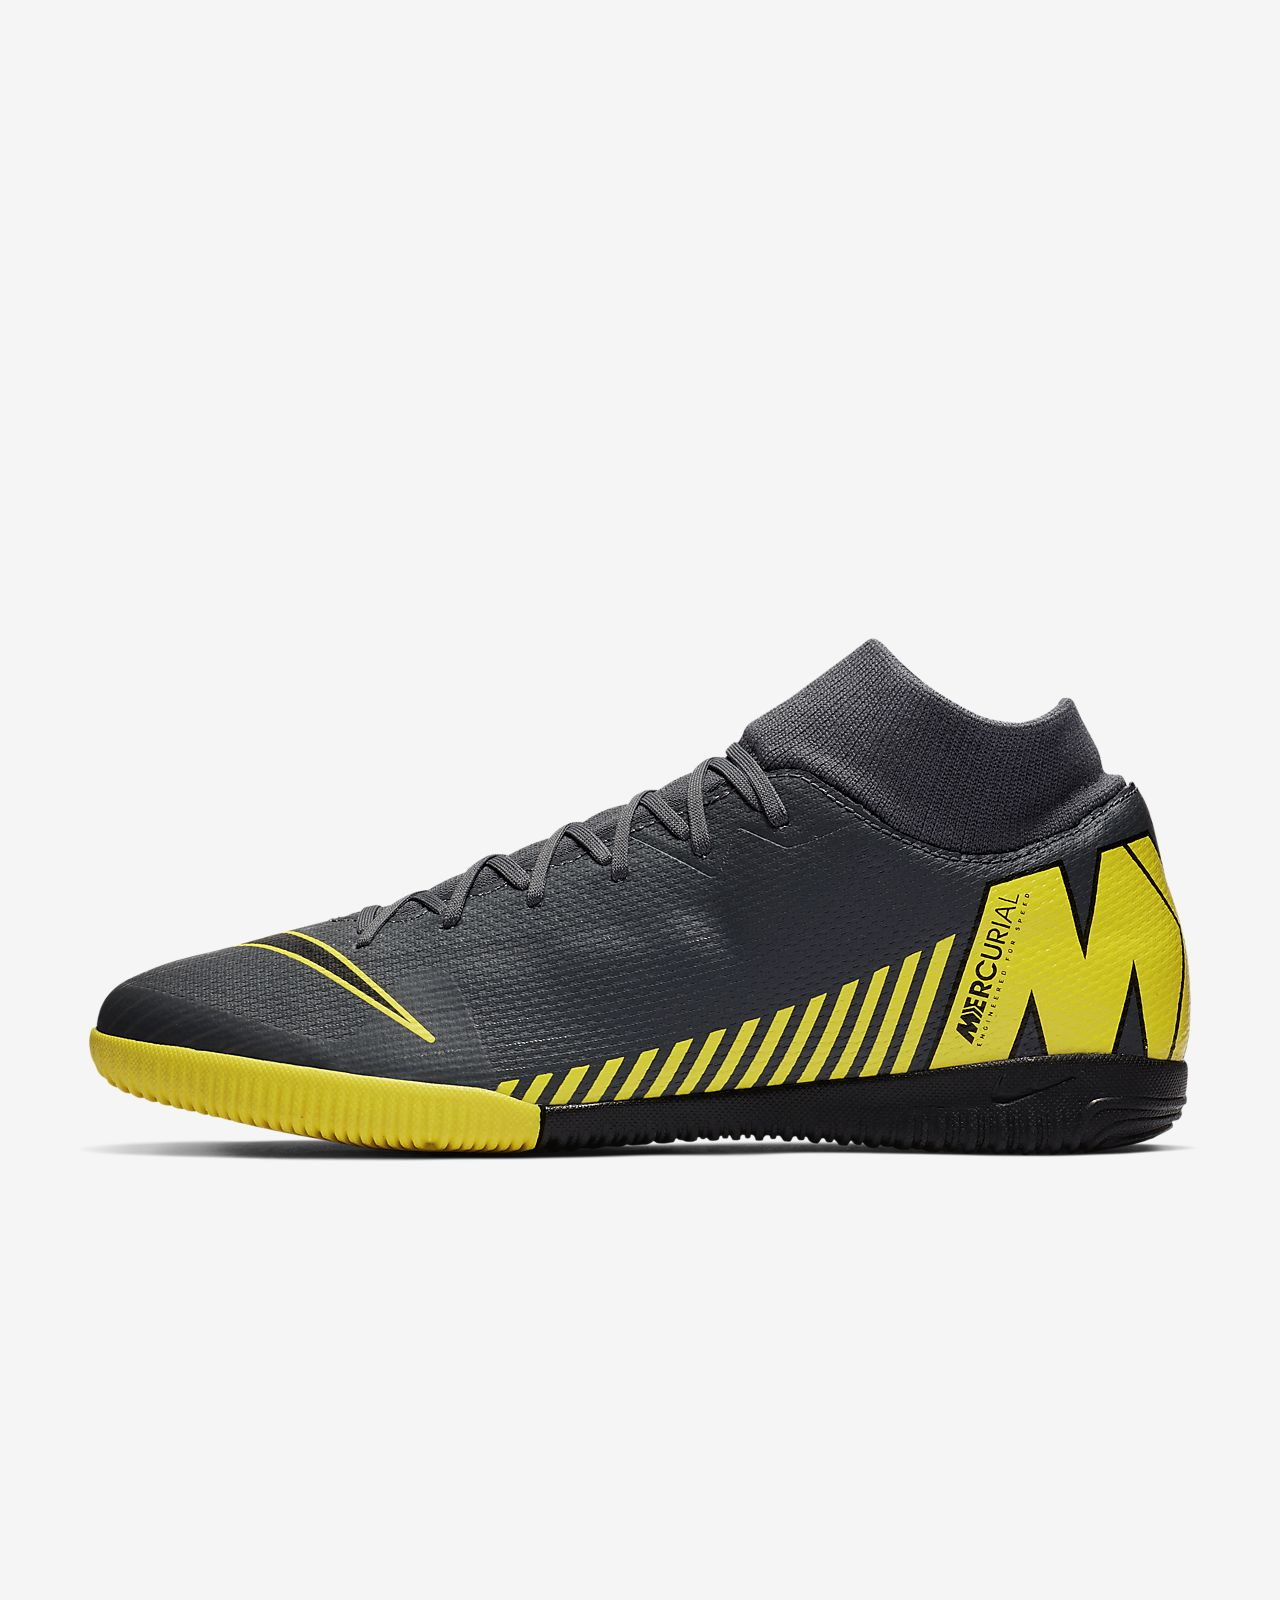 1b2934d89848 Nike SuperflyX 6 Academy IC Indoor Court Football Boot. Nike.com GB